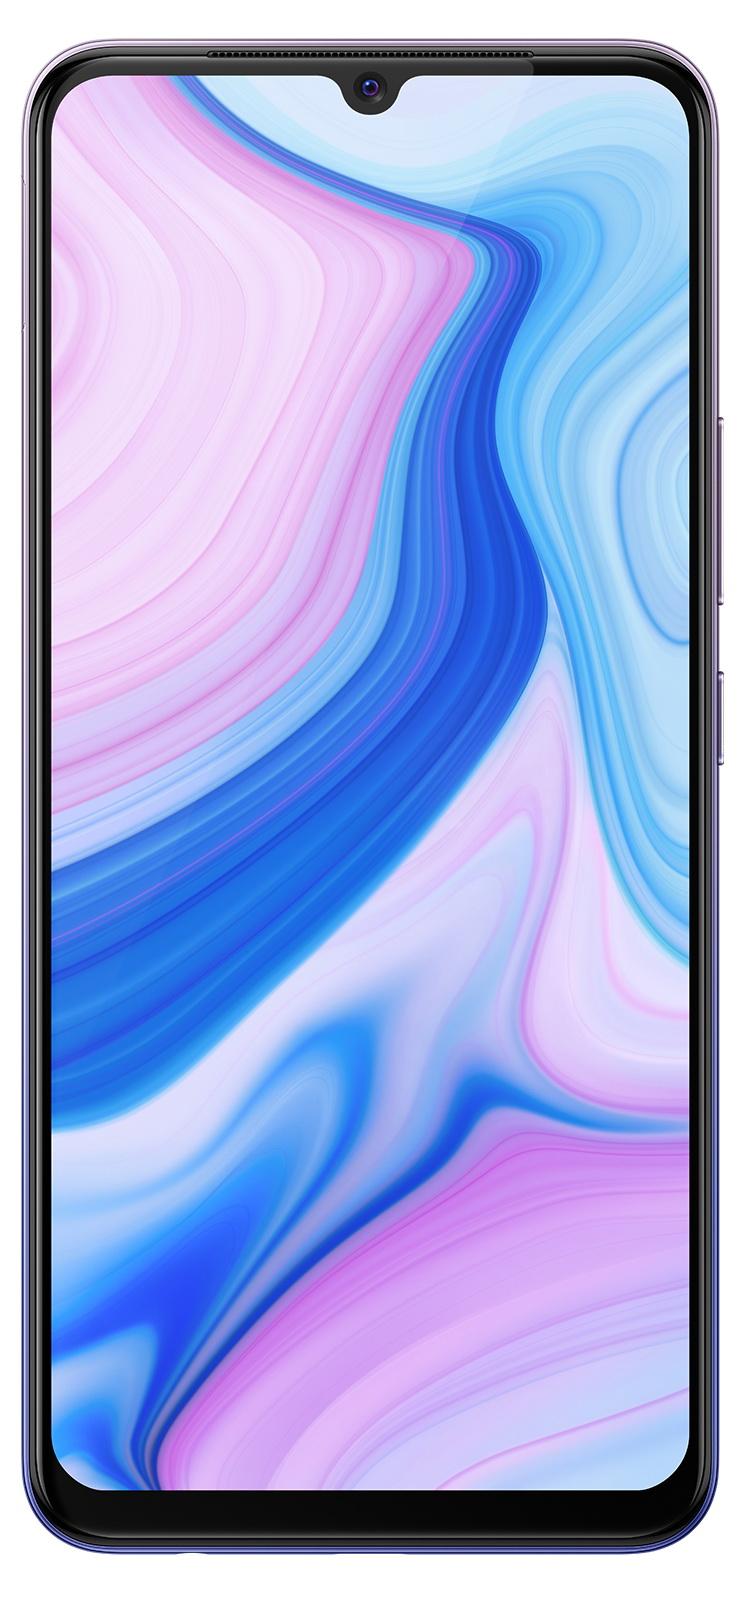 Первый смартфон на Android 11 в России уже скоро Другие устройства  - pervyj_smartfon_na_android_11_v_prodazhe_v_rossii_na_sleduushej_nedele_3